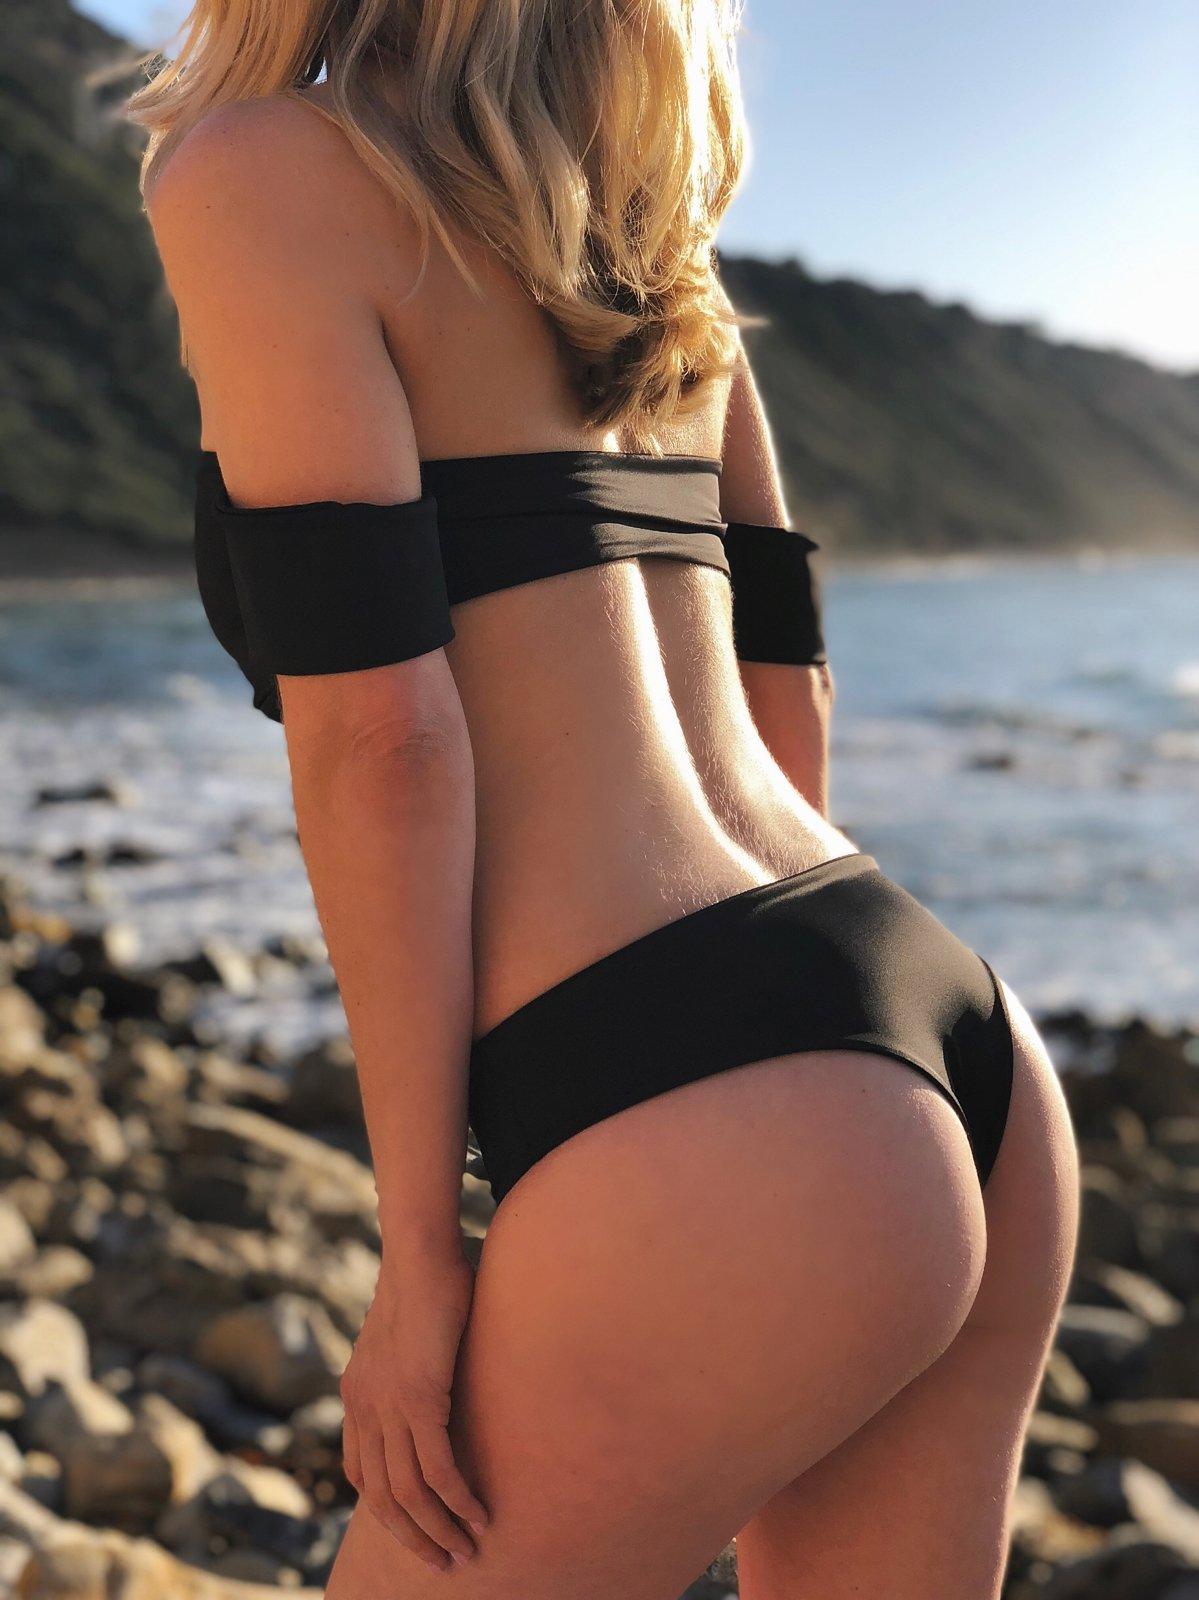 Image of Bandau Bikini Top with arm sleeves with Cheeky Bottoms